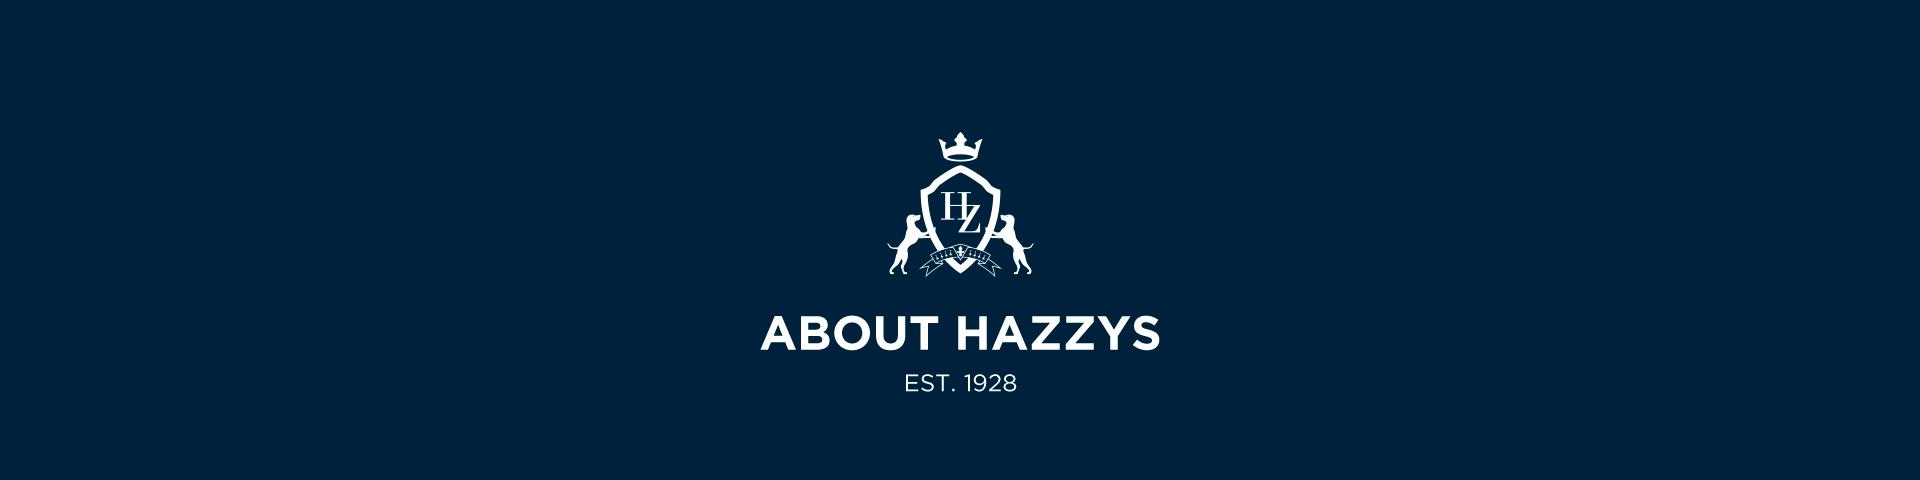 Hazzys 中国